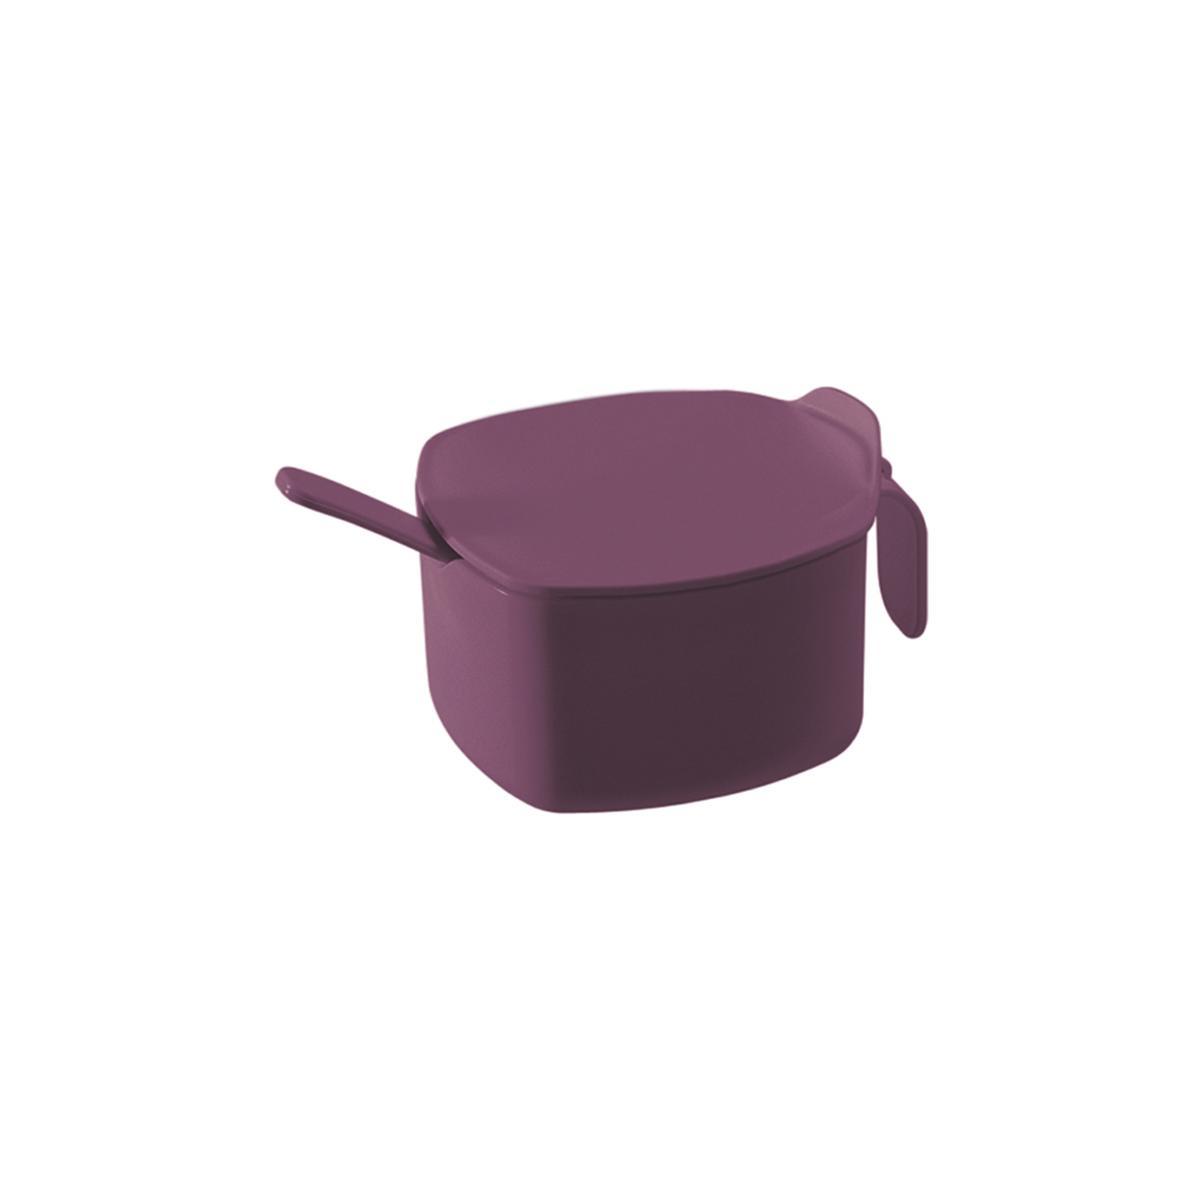 Açucareiro Due 300 ml Casual Roxo Púrpura Coza